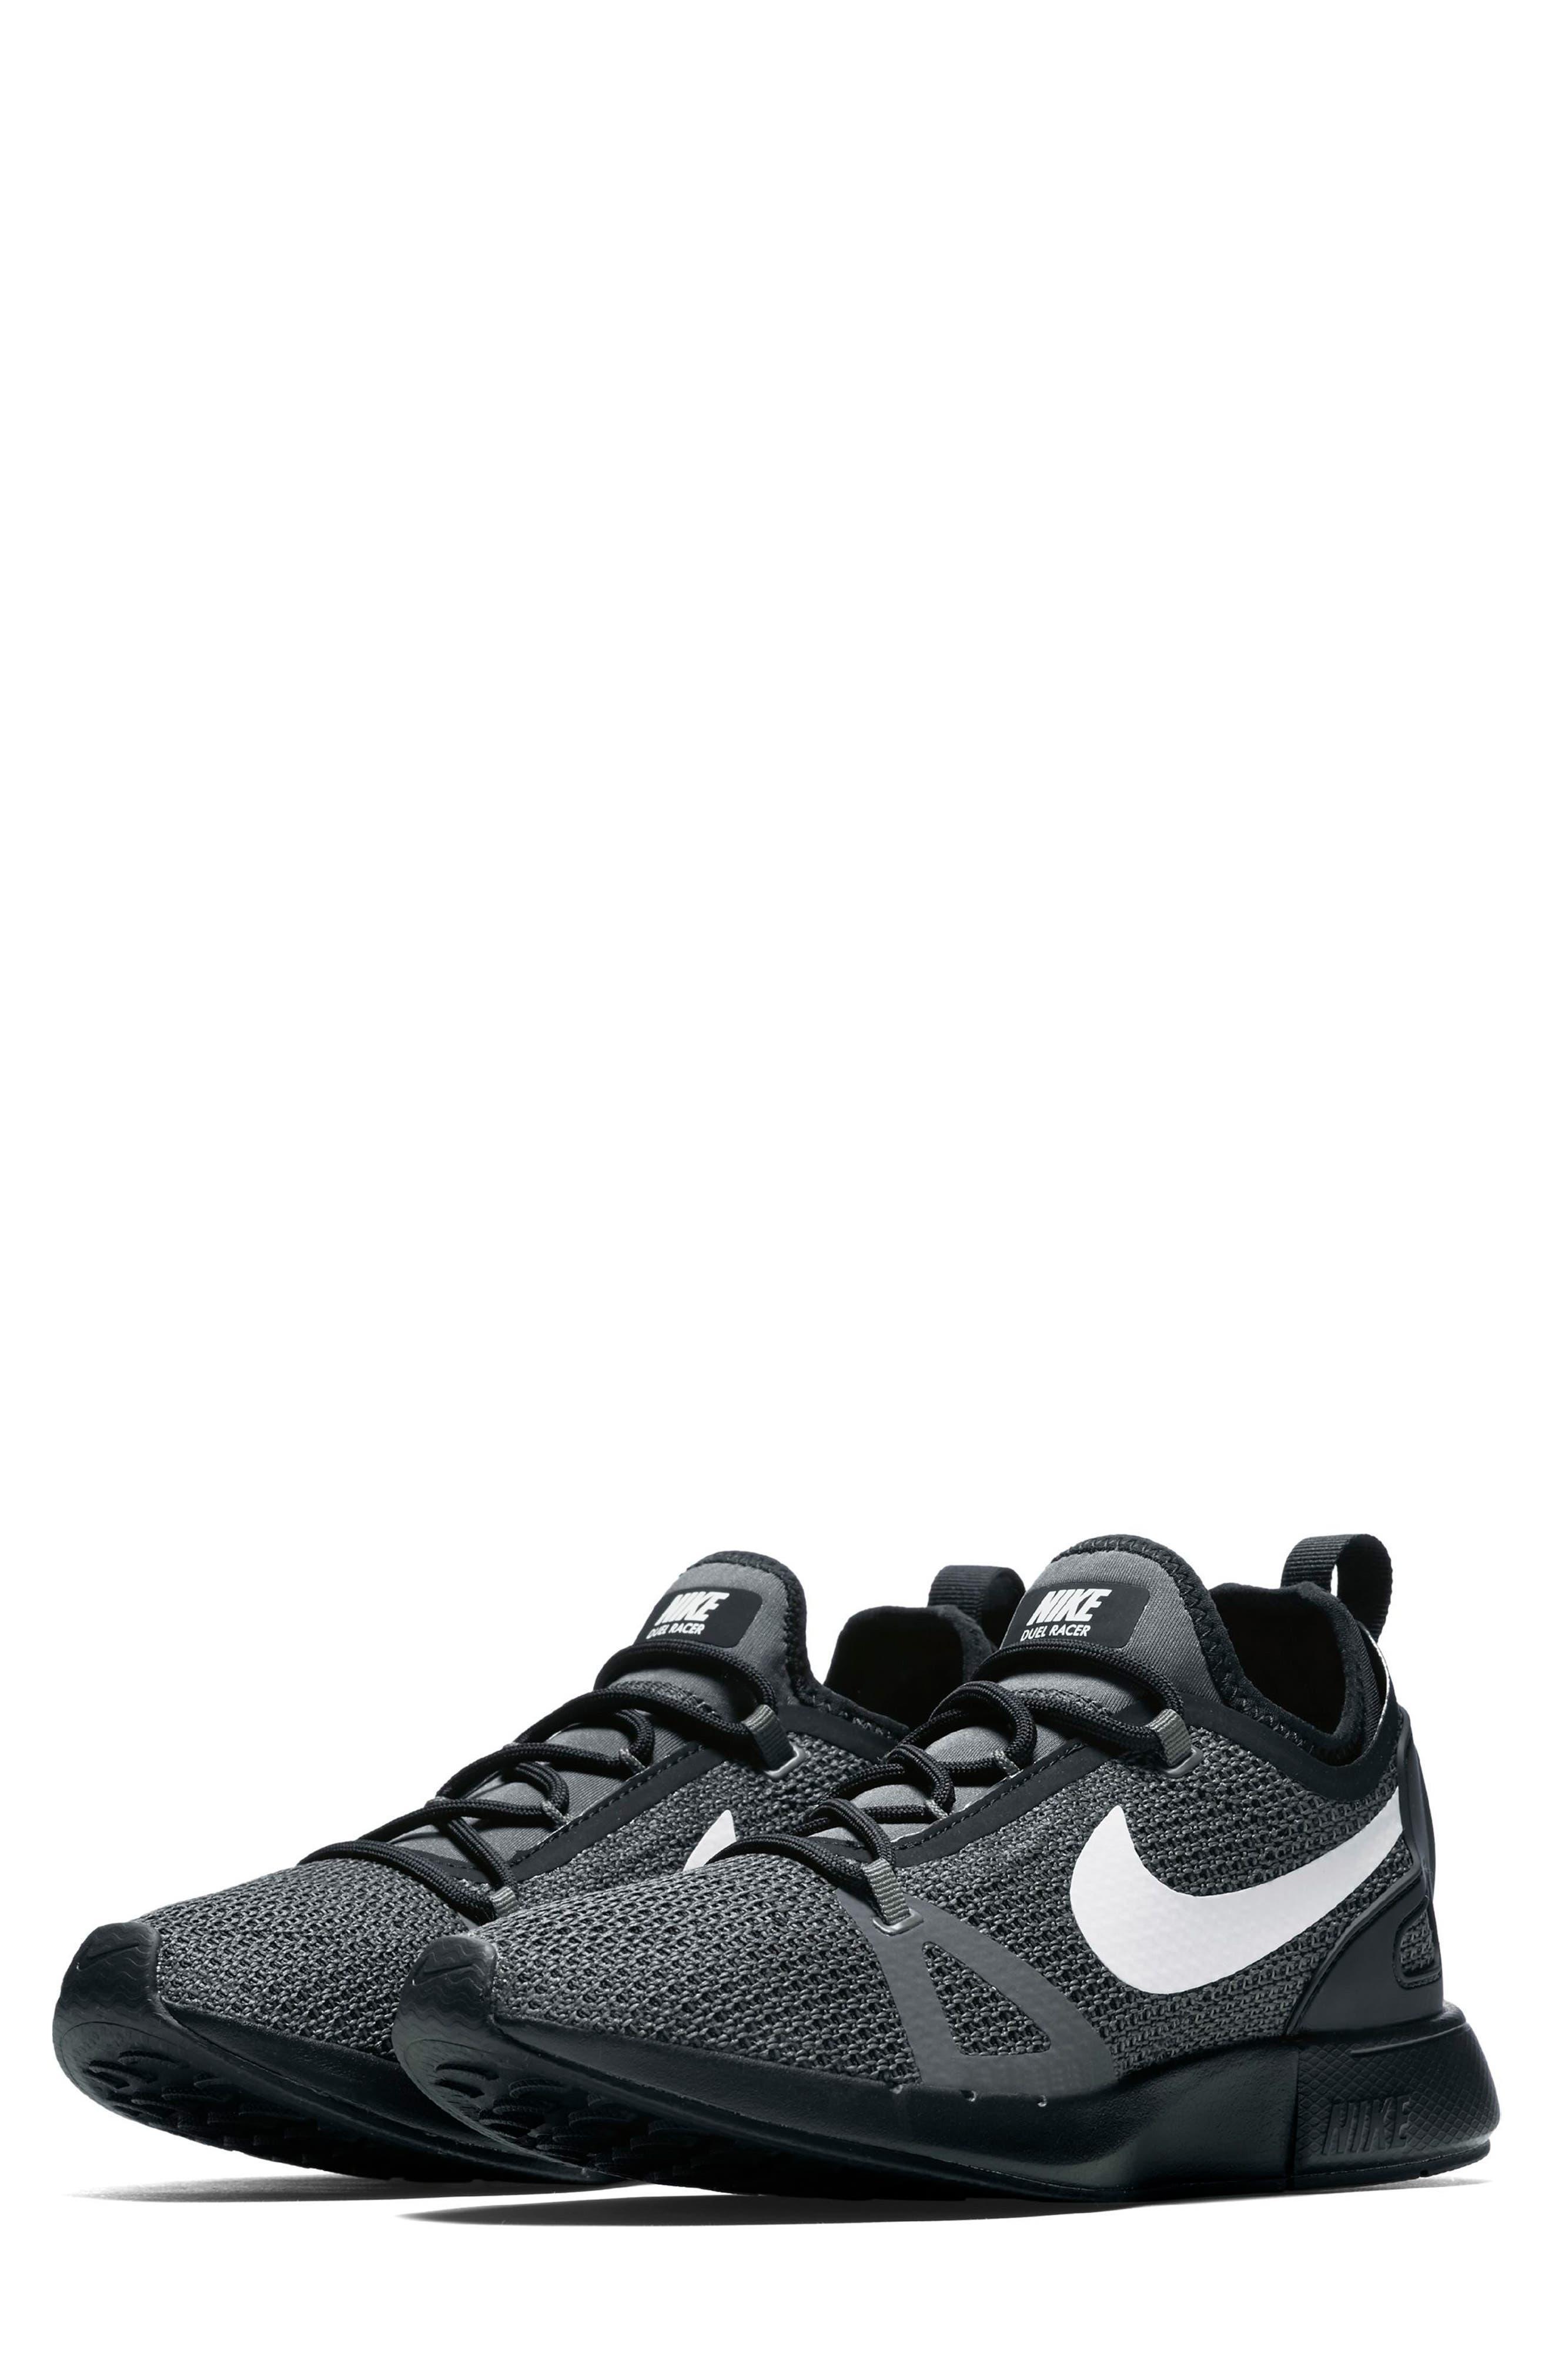 Main Image - Nike Duel Racer PRM Running Shoe (Women)